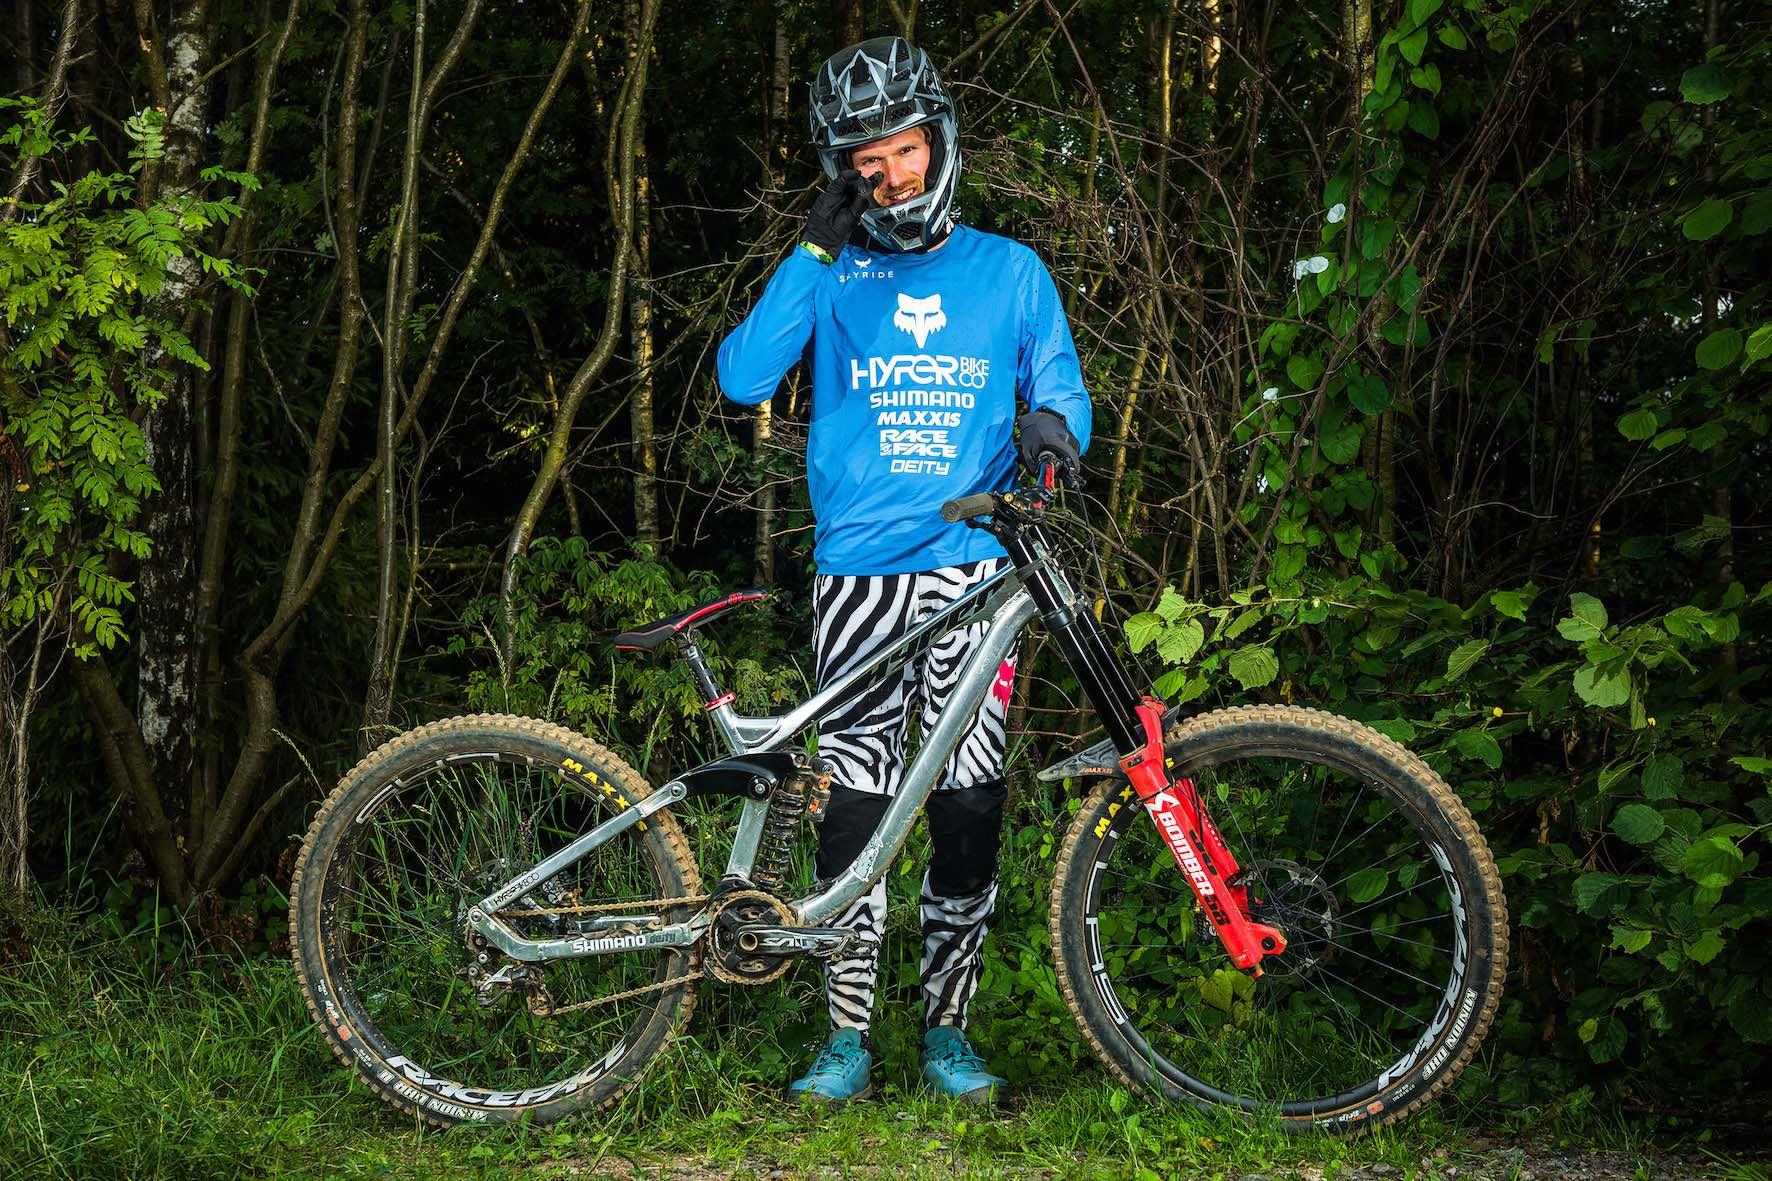 Bikes of Loosefest XL - Bas van Steenbergen on Hyper